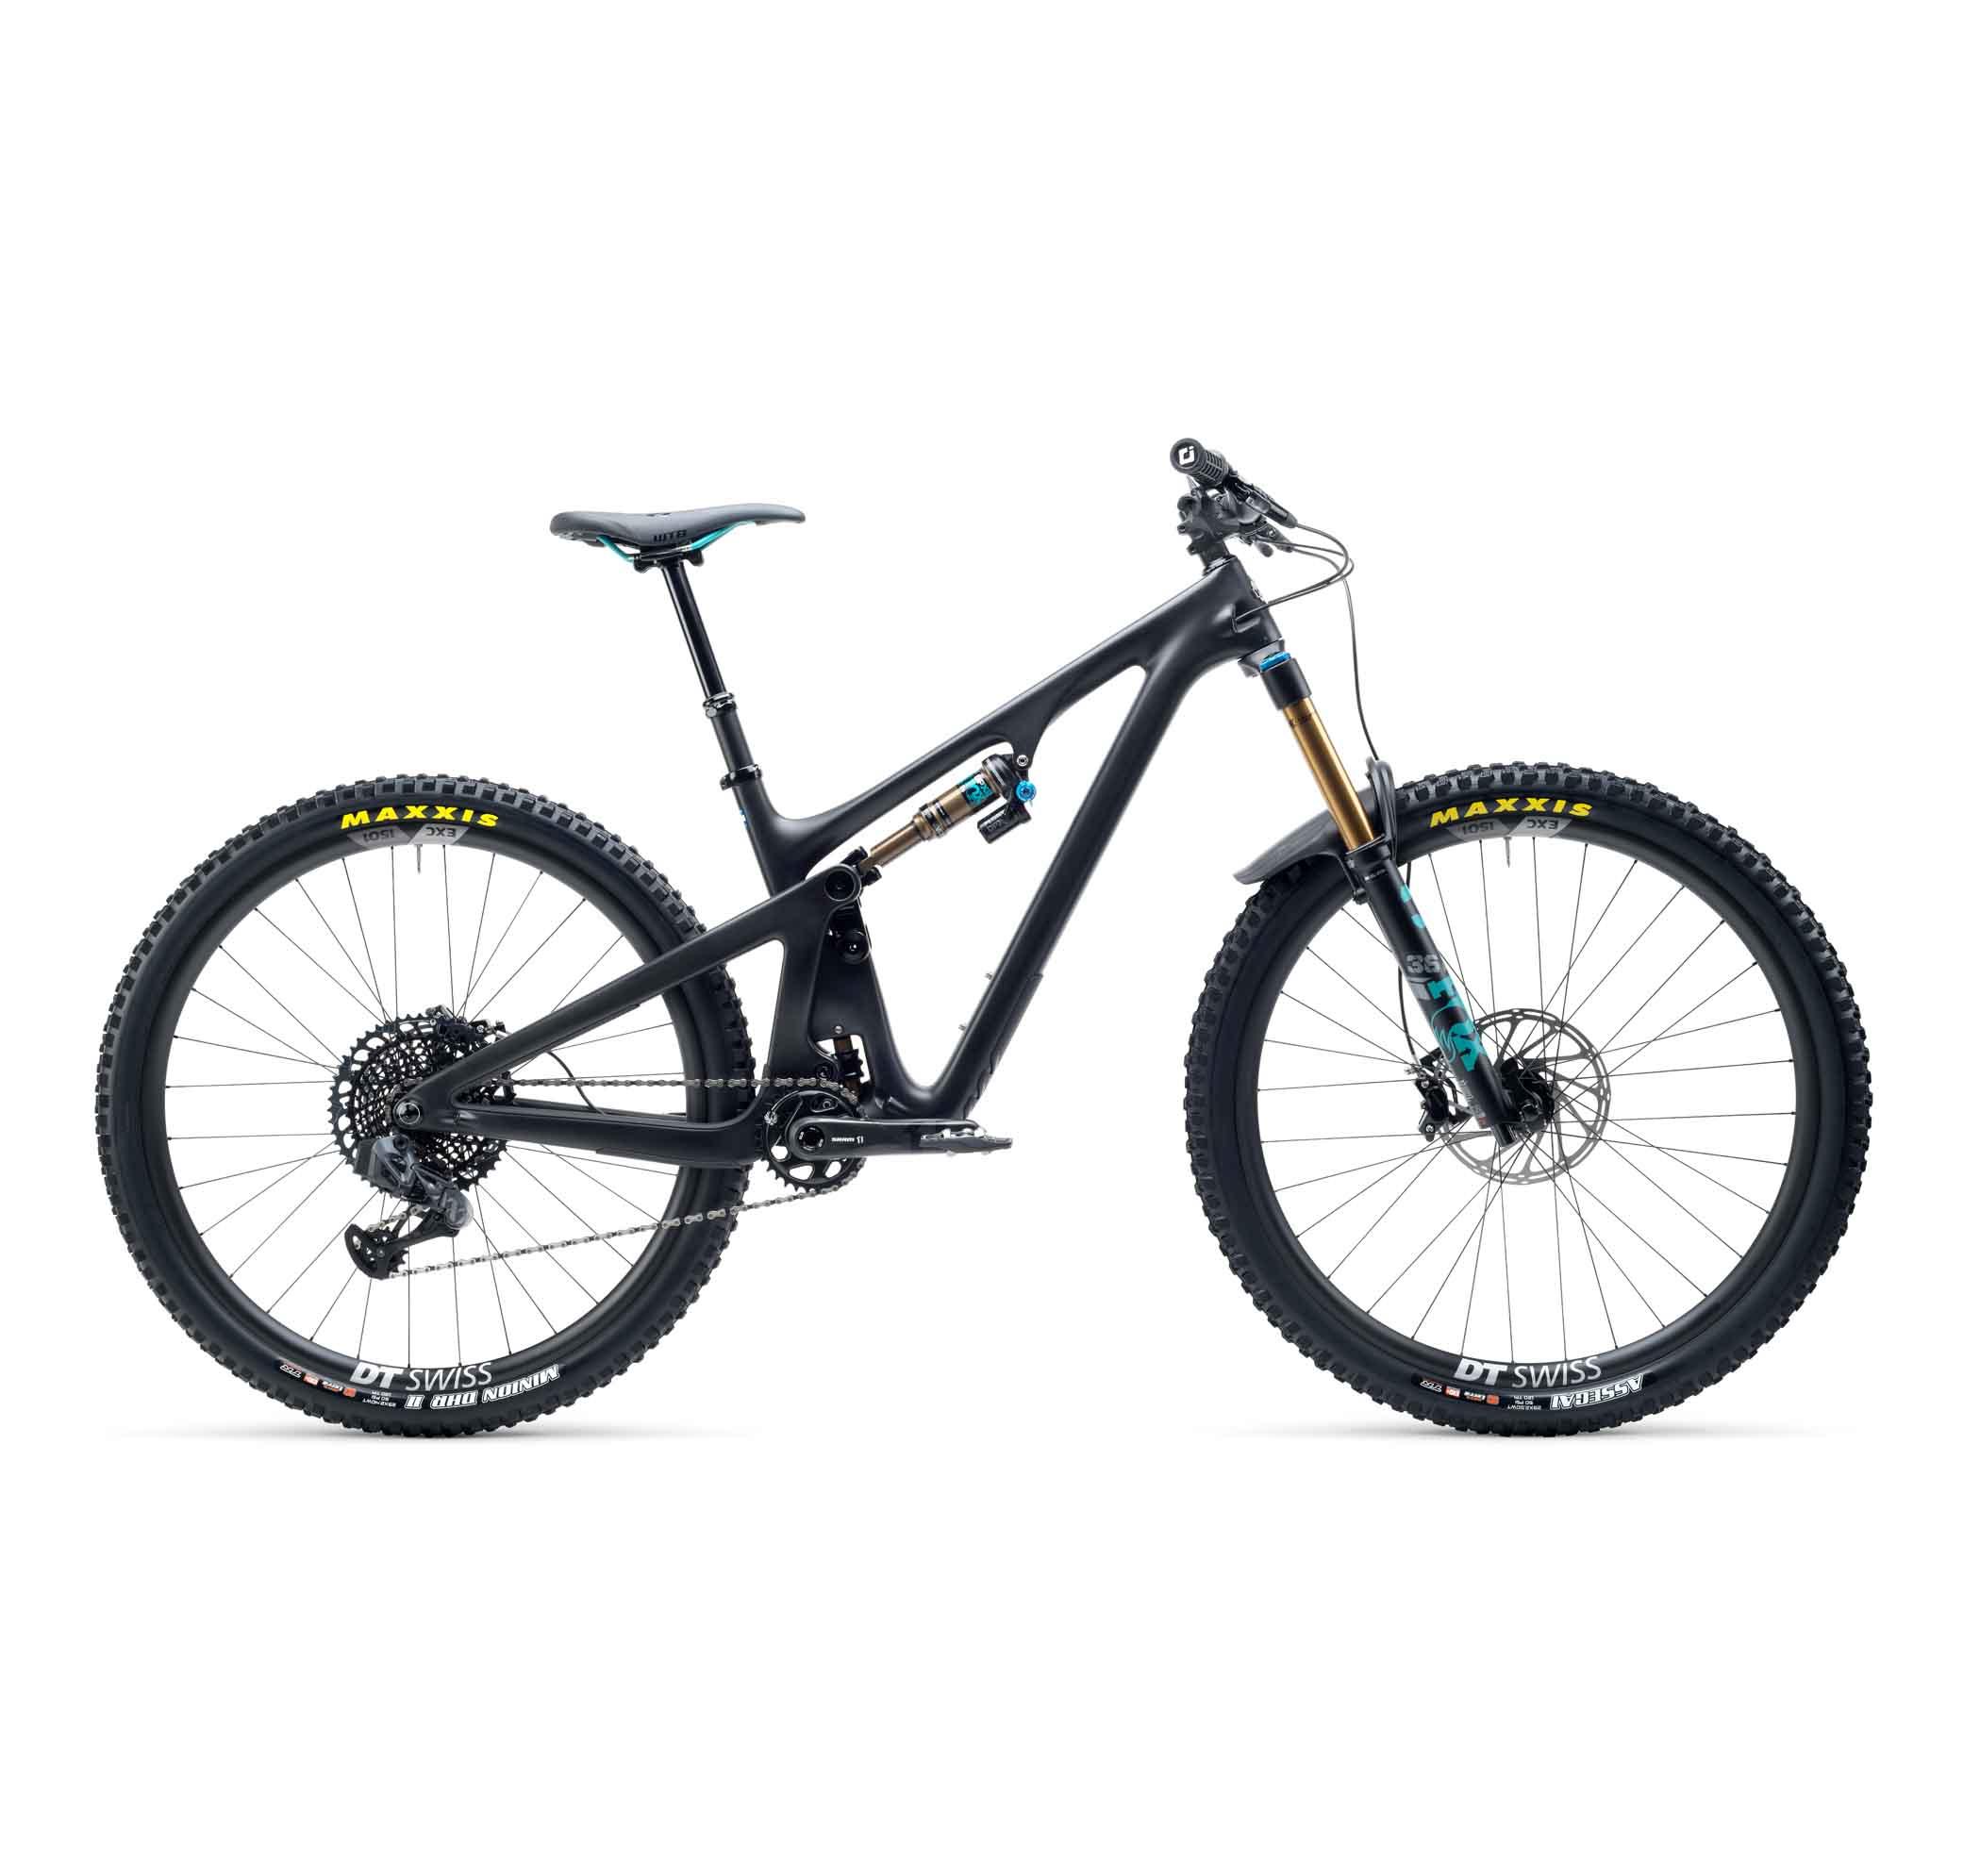 Yeti_Cycles_Rodeo_Bike_SB130_LR_Black